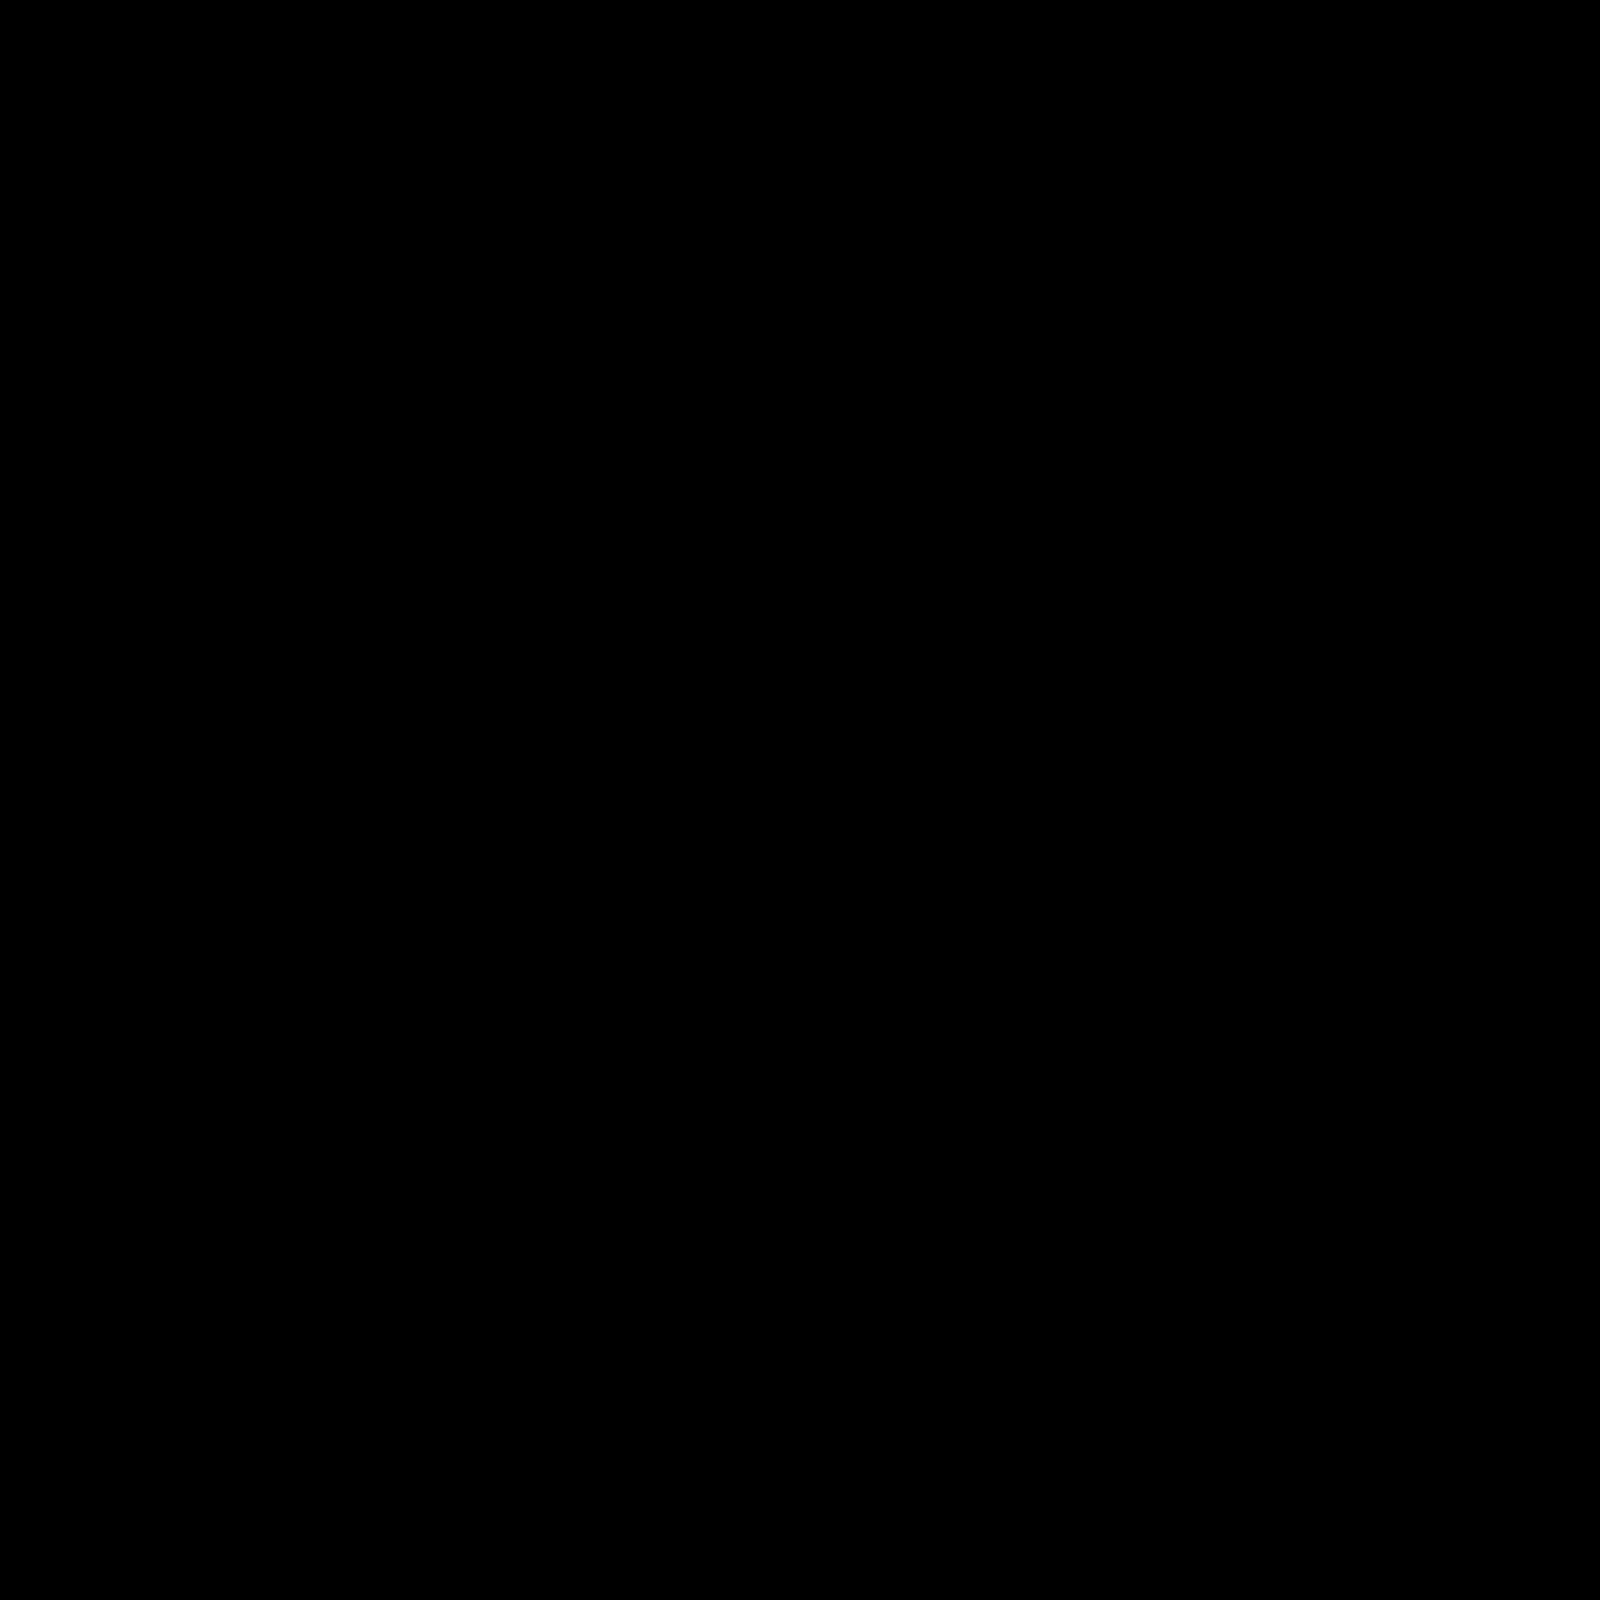 SmcFanControl ロゴ icon